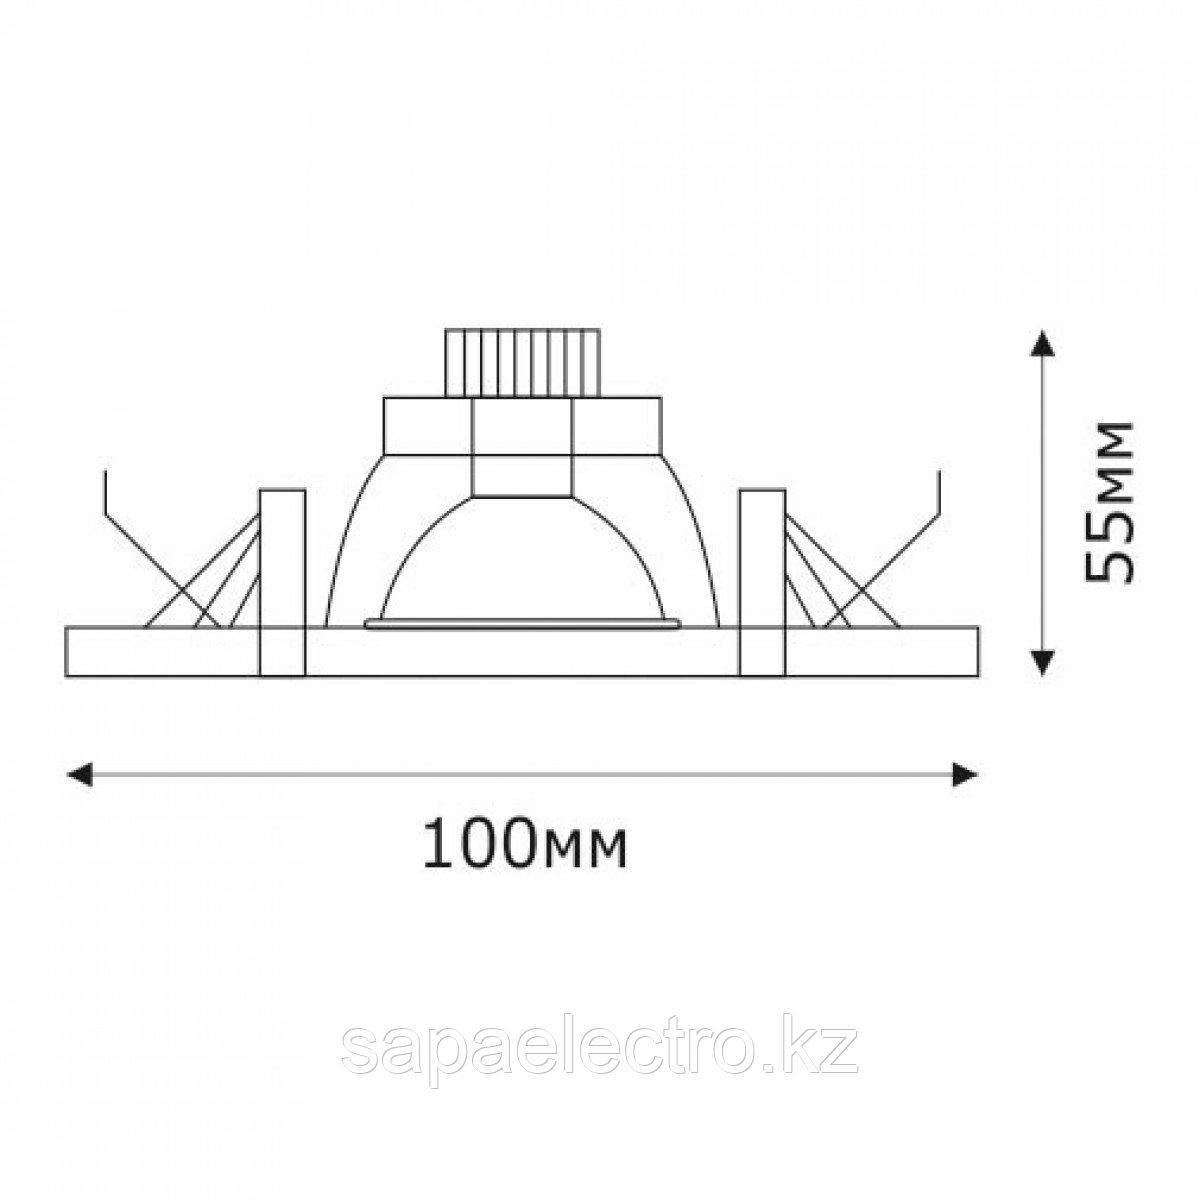 Спот LED JL-QS-S28B-R ROUND 3W 5000K (TS) 60шт